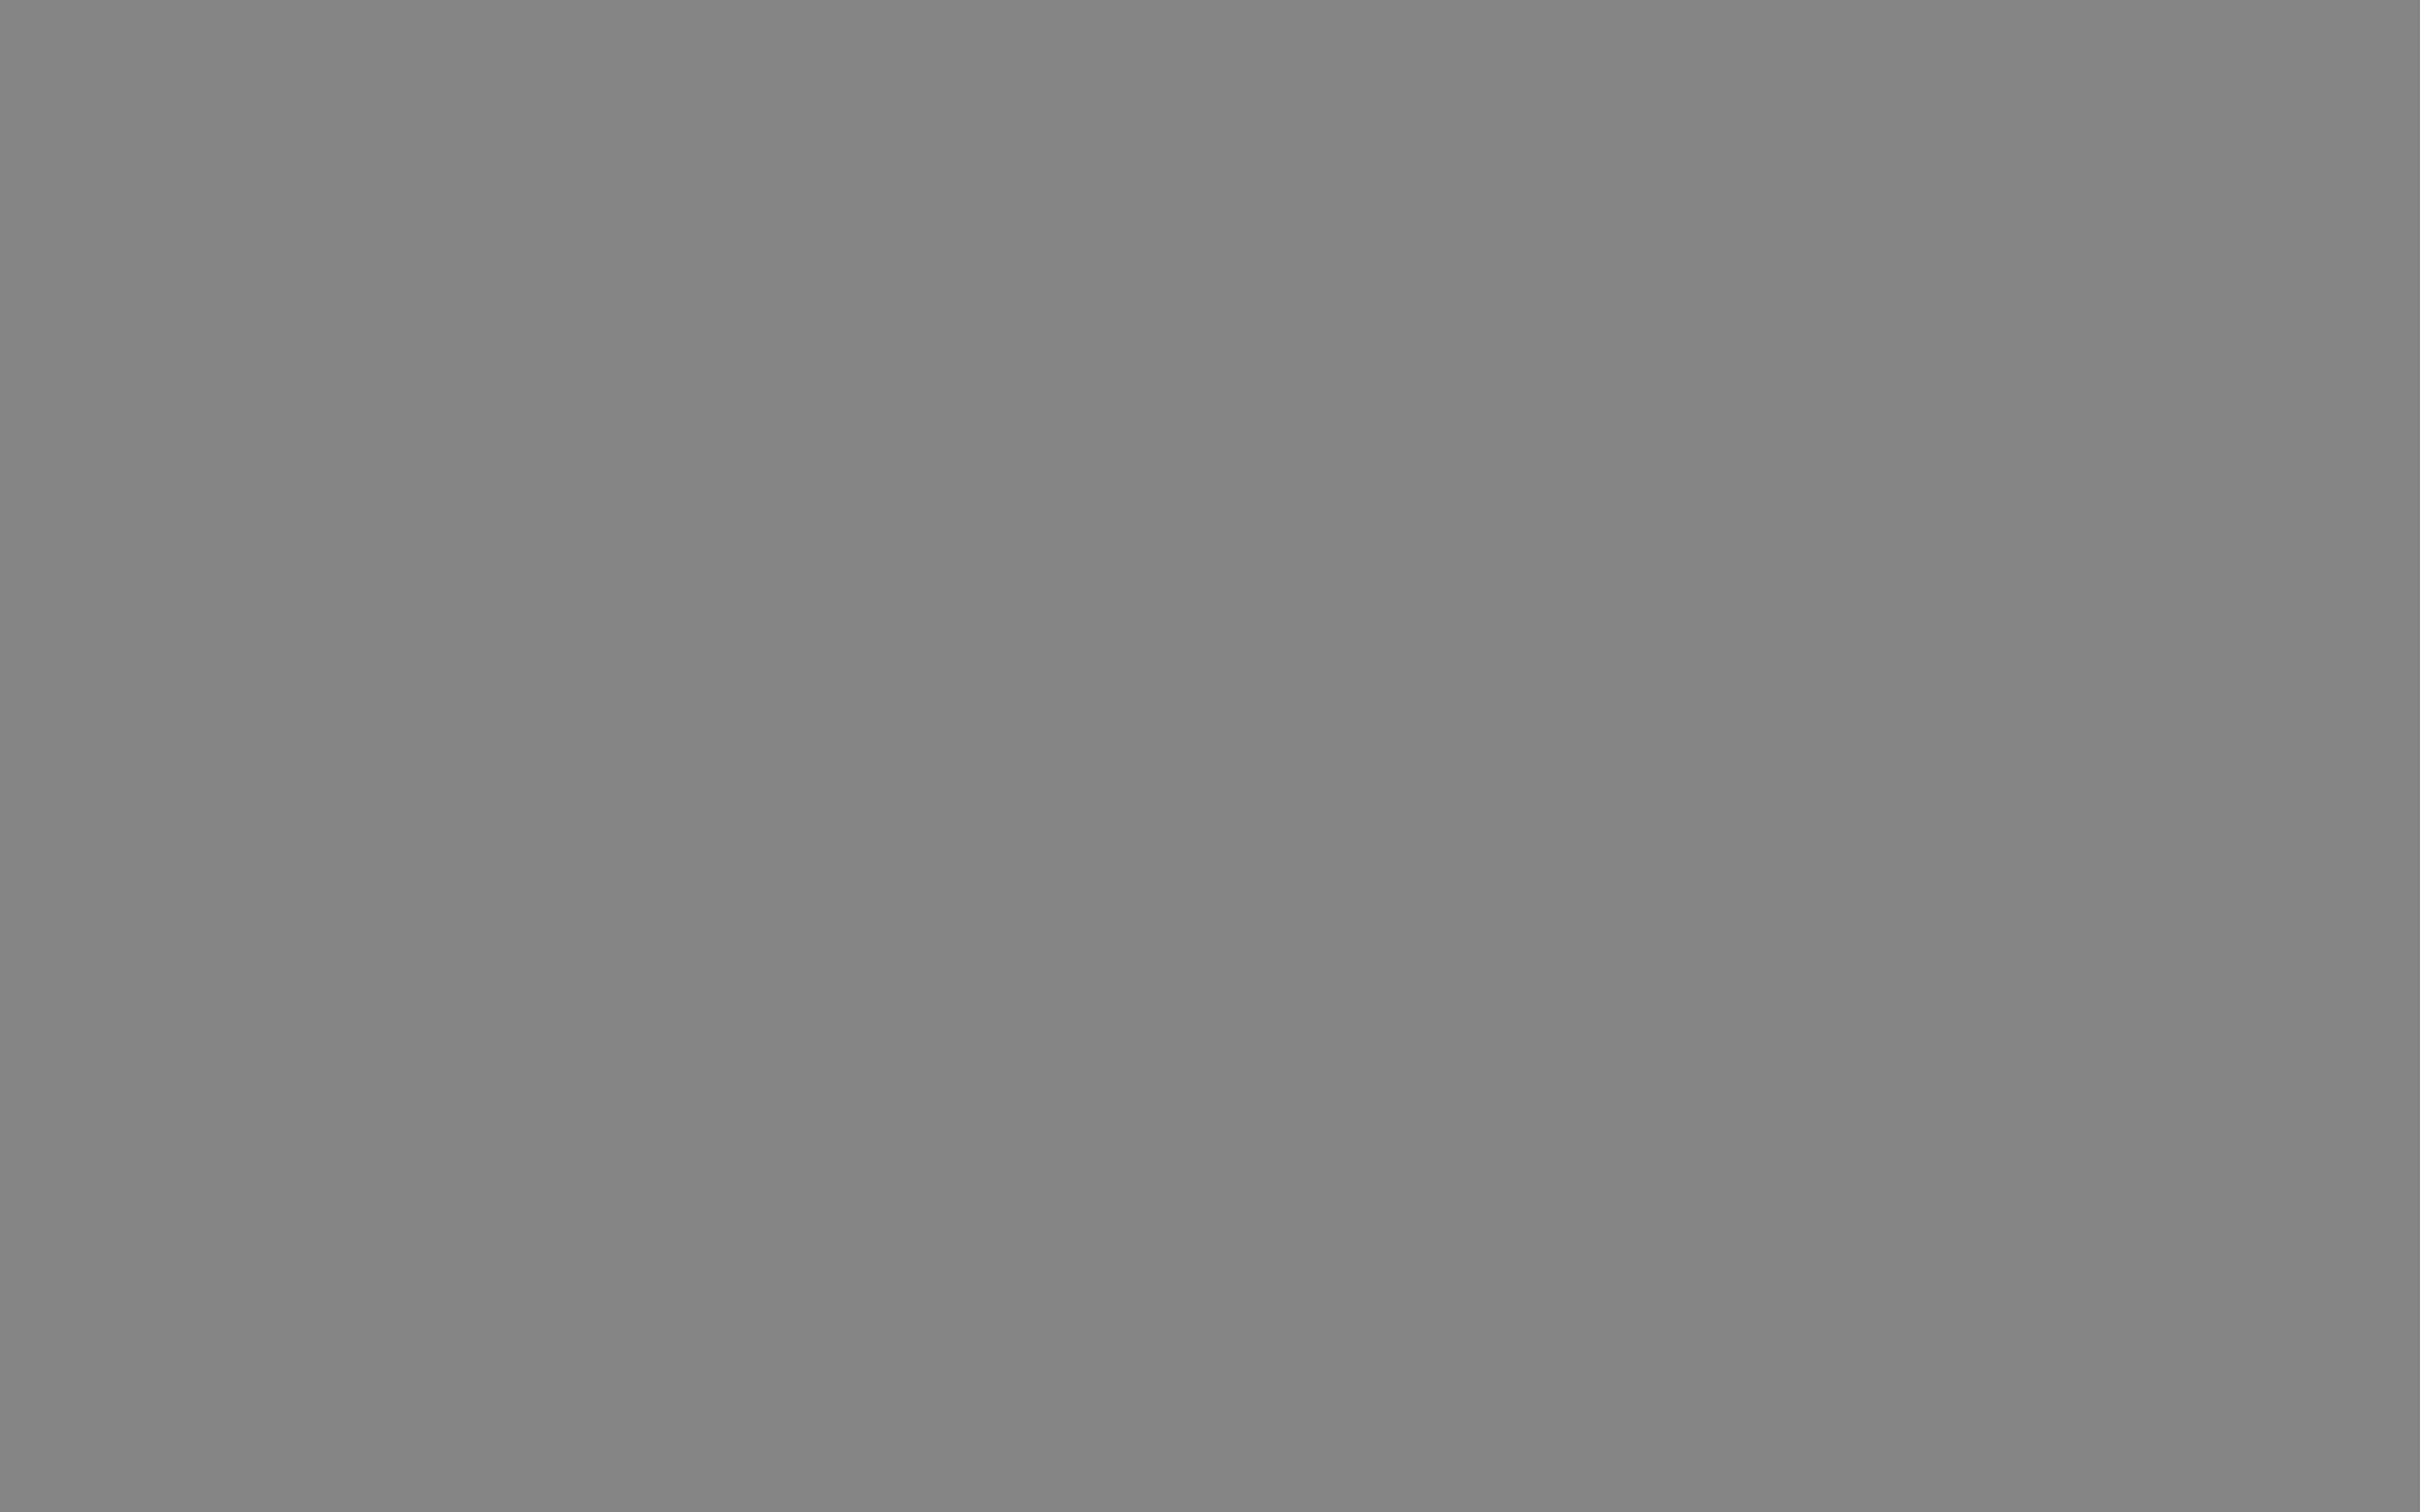 2560x1600 Battleship Grey Solid Color Background